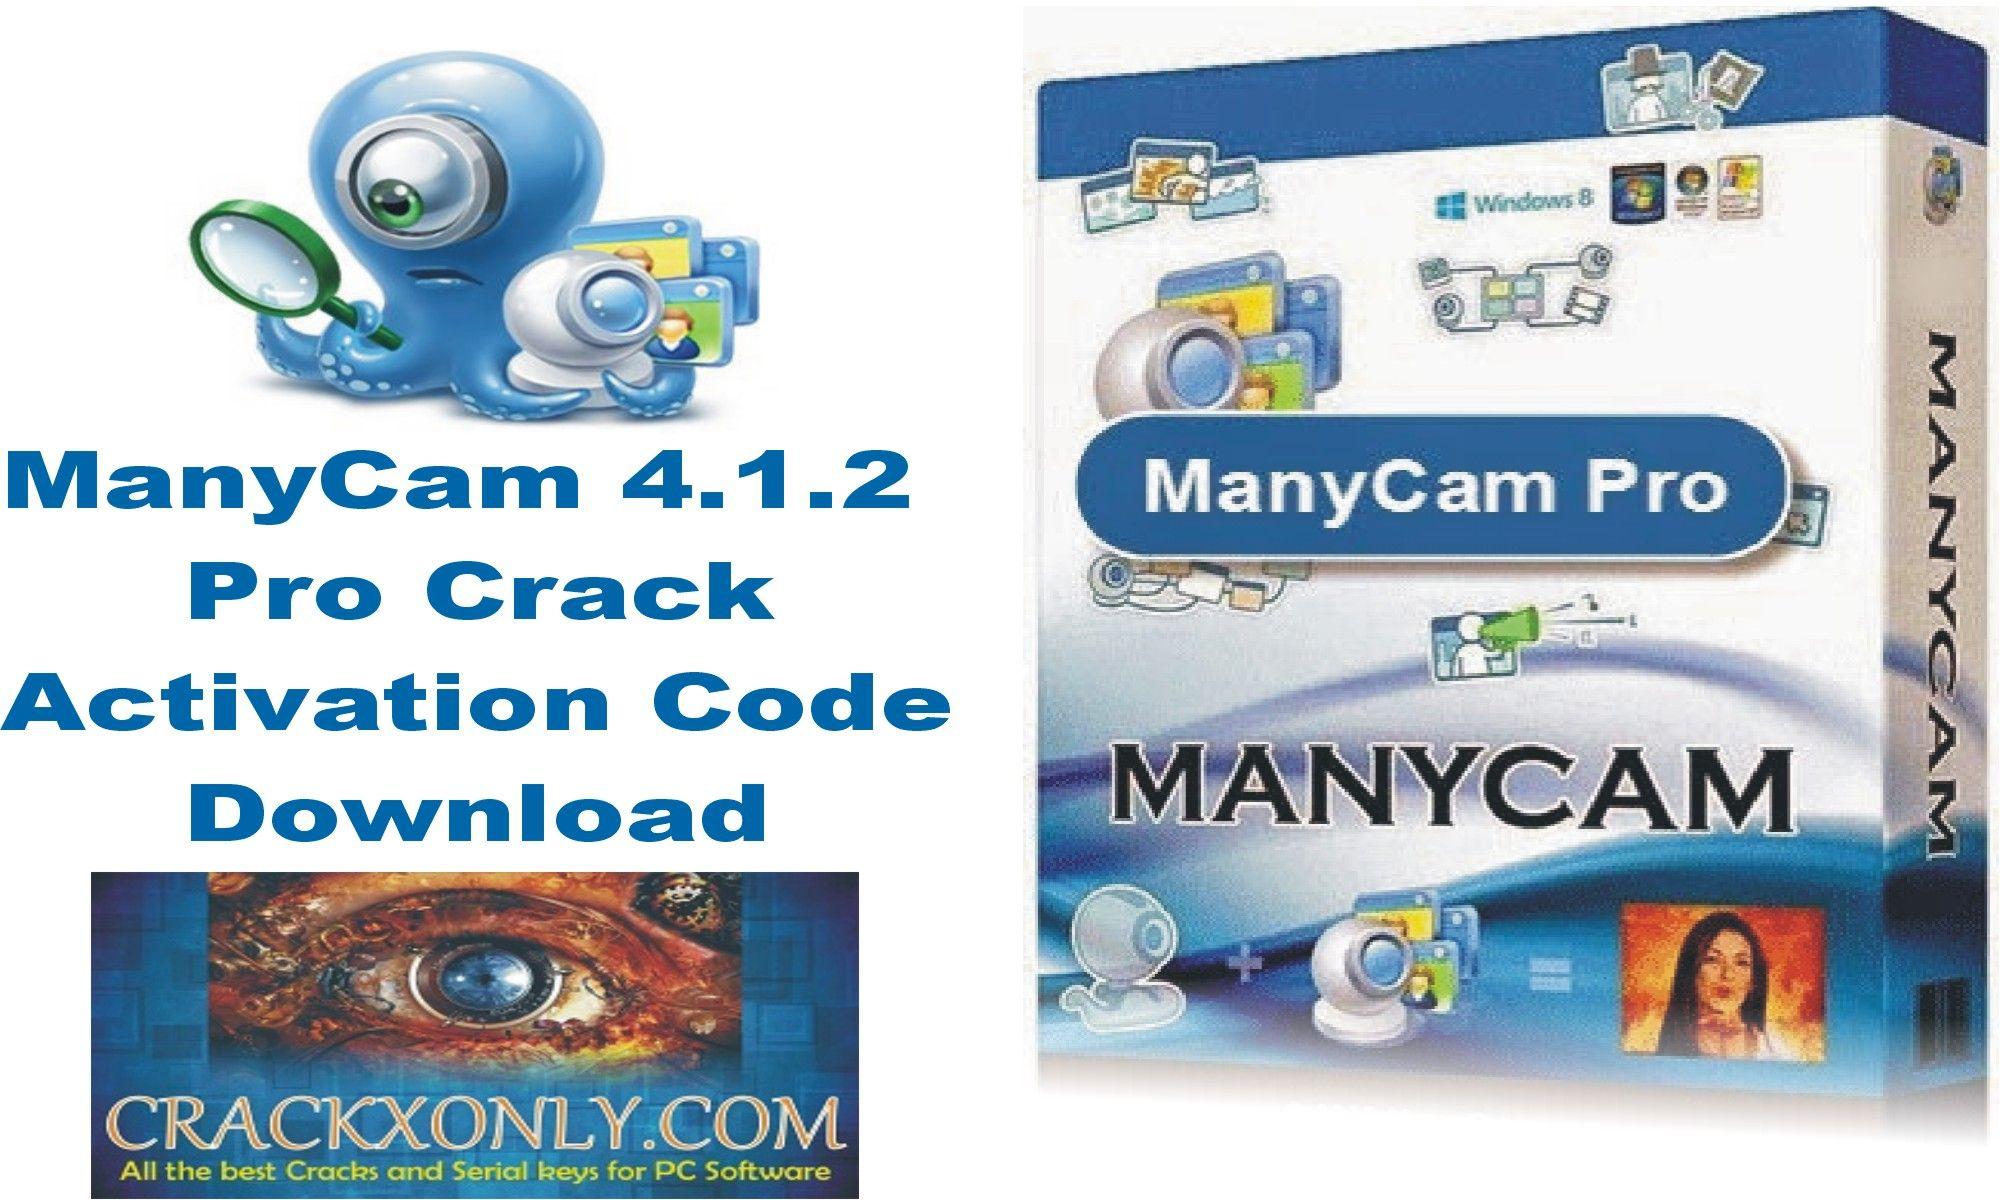 Download manycam enterprise 5 0 5 2 multilingual - Nero Platinum Crack 2017 Serial Key Full Free Download Nero Platinum Crack Download Nero Platinum 2017 Download Nero Platinum Serial Key Downloa